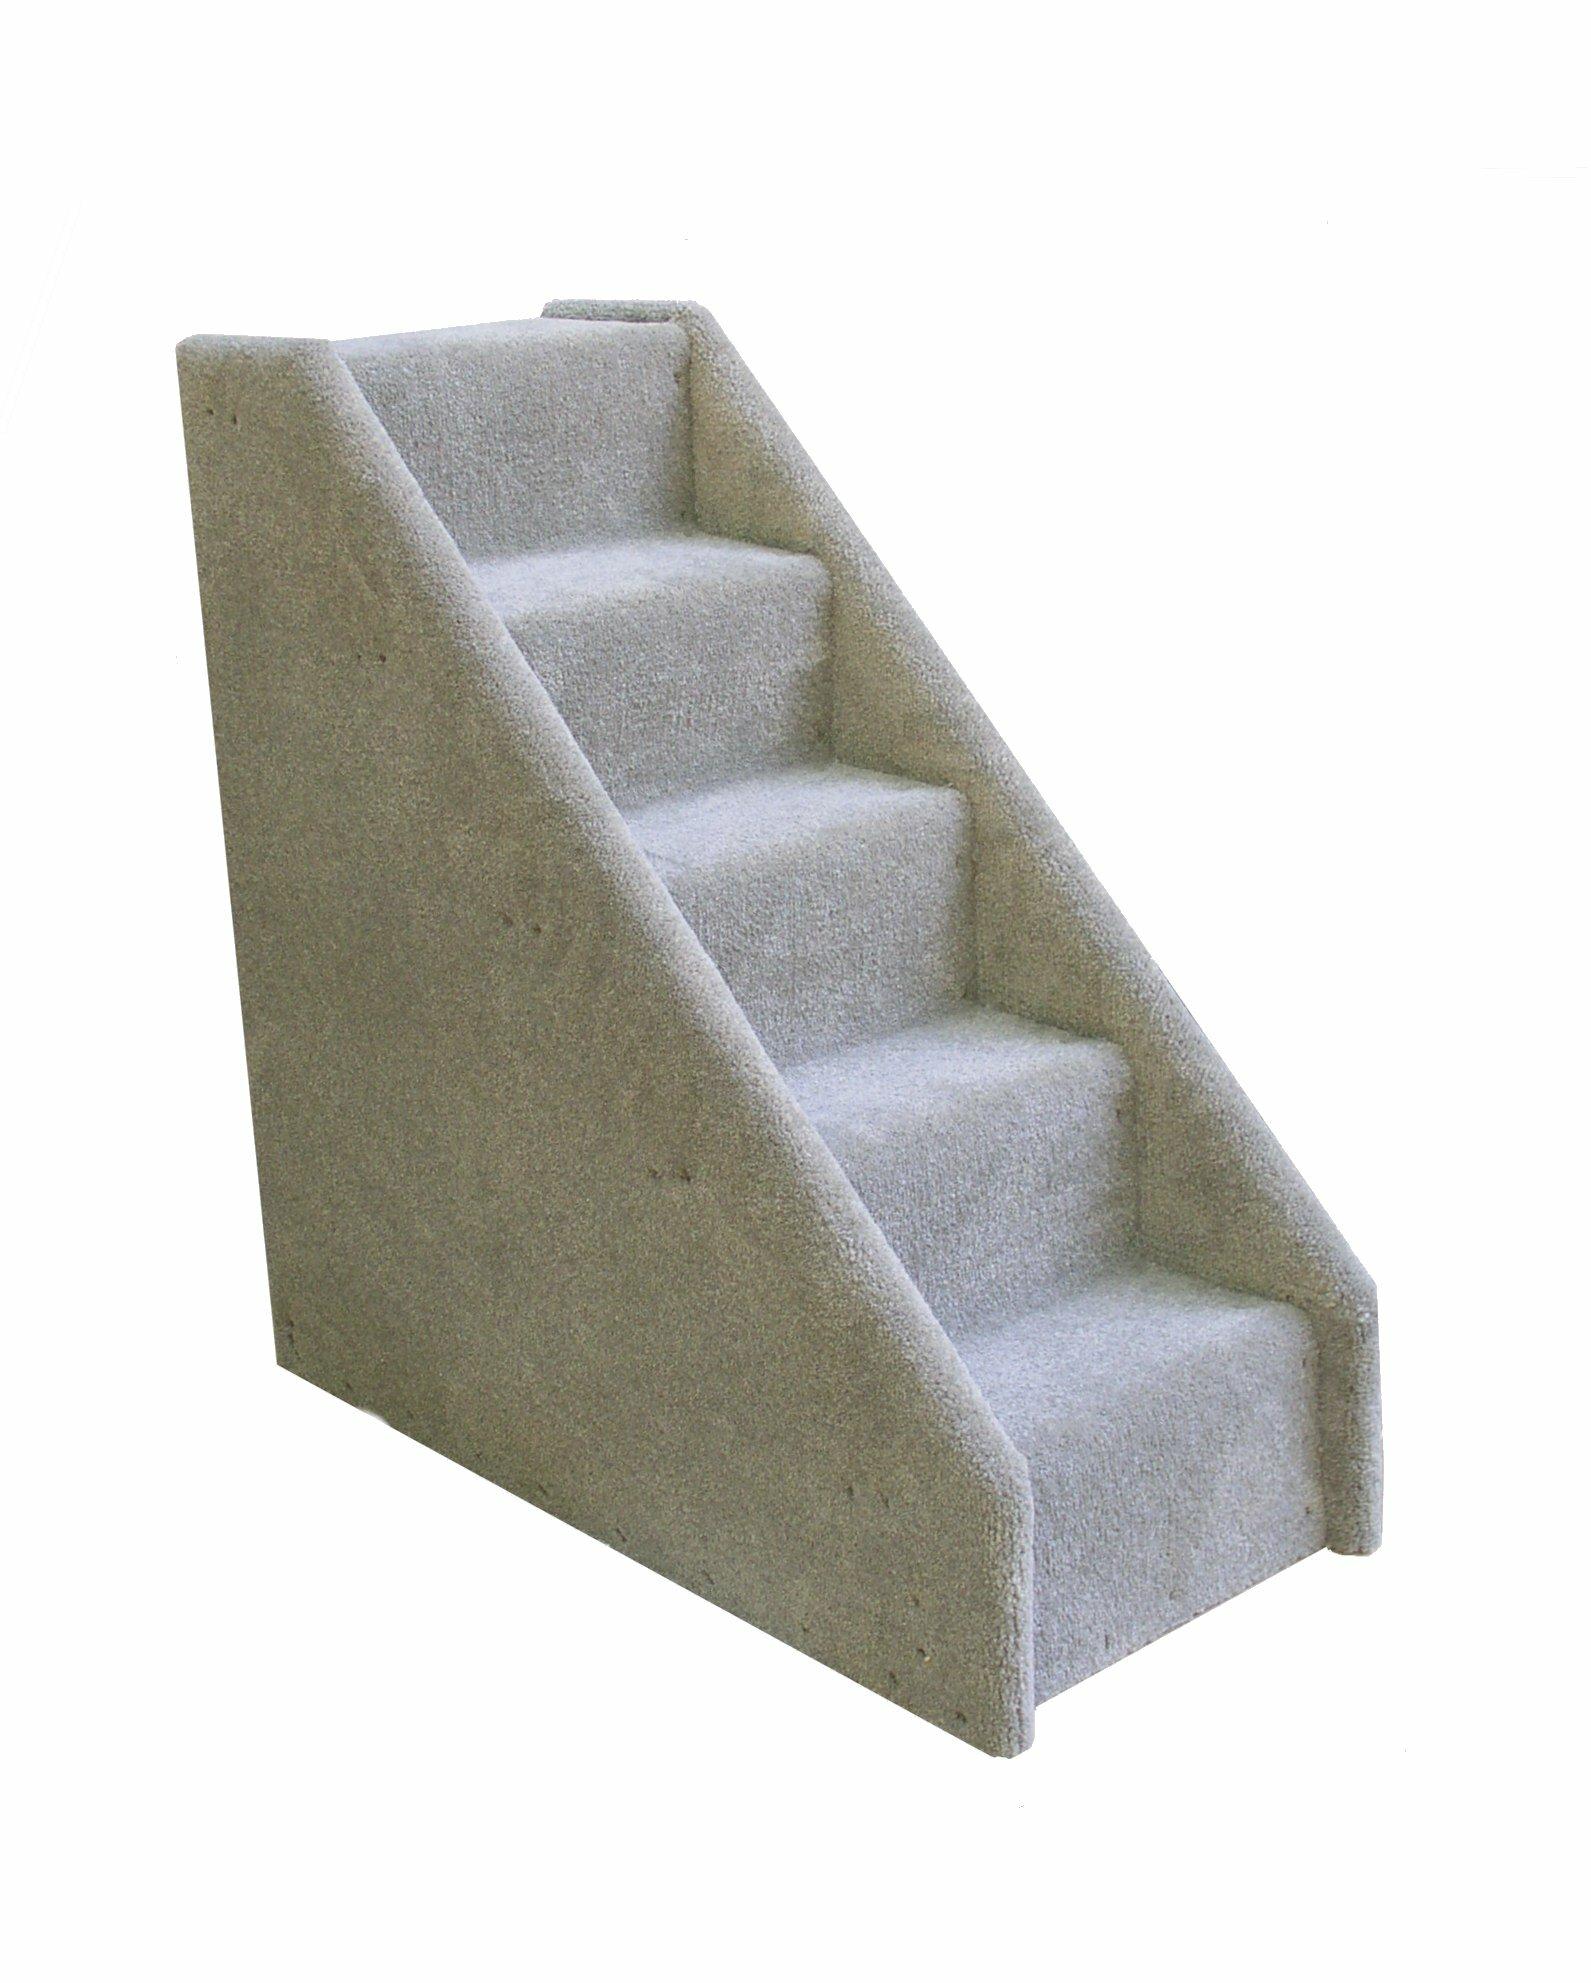 Genial Animal Stuff Bearu0027s Stairs™ 5 Step Mini Carpeted Pet Stairs U0026 Reviews |  Wayfair